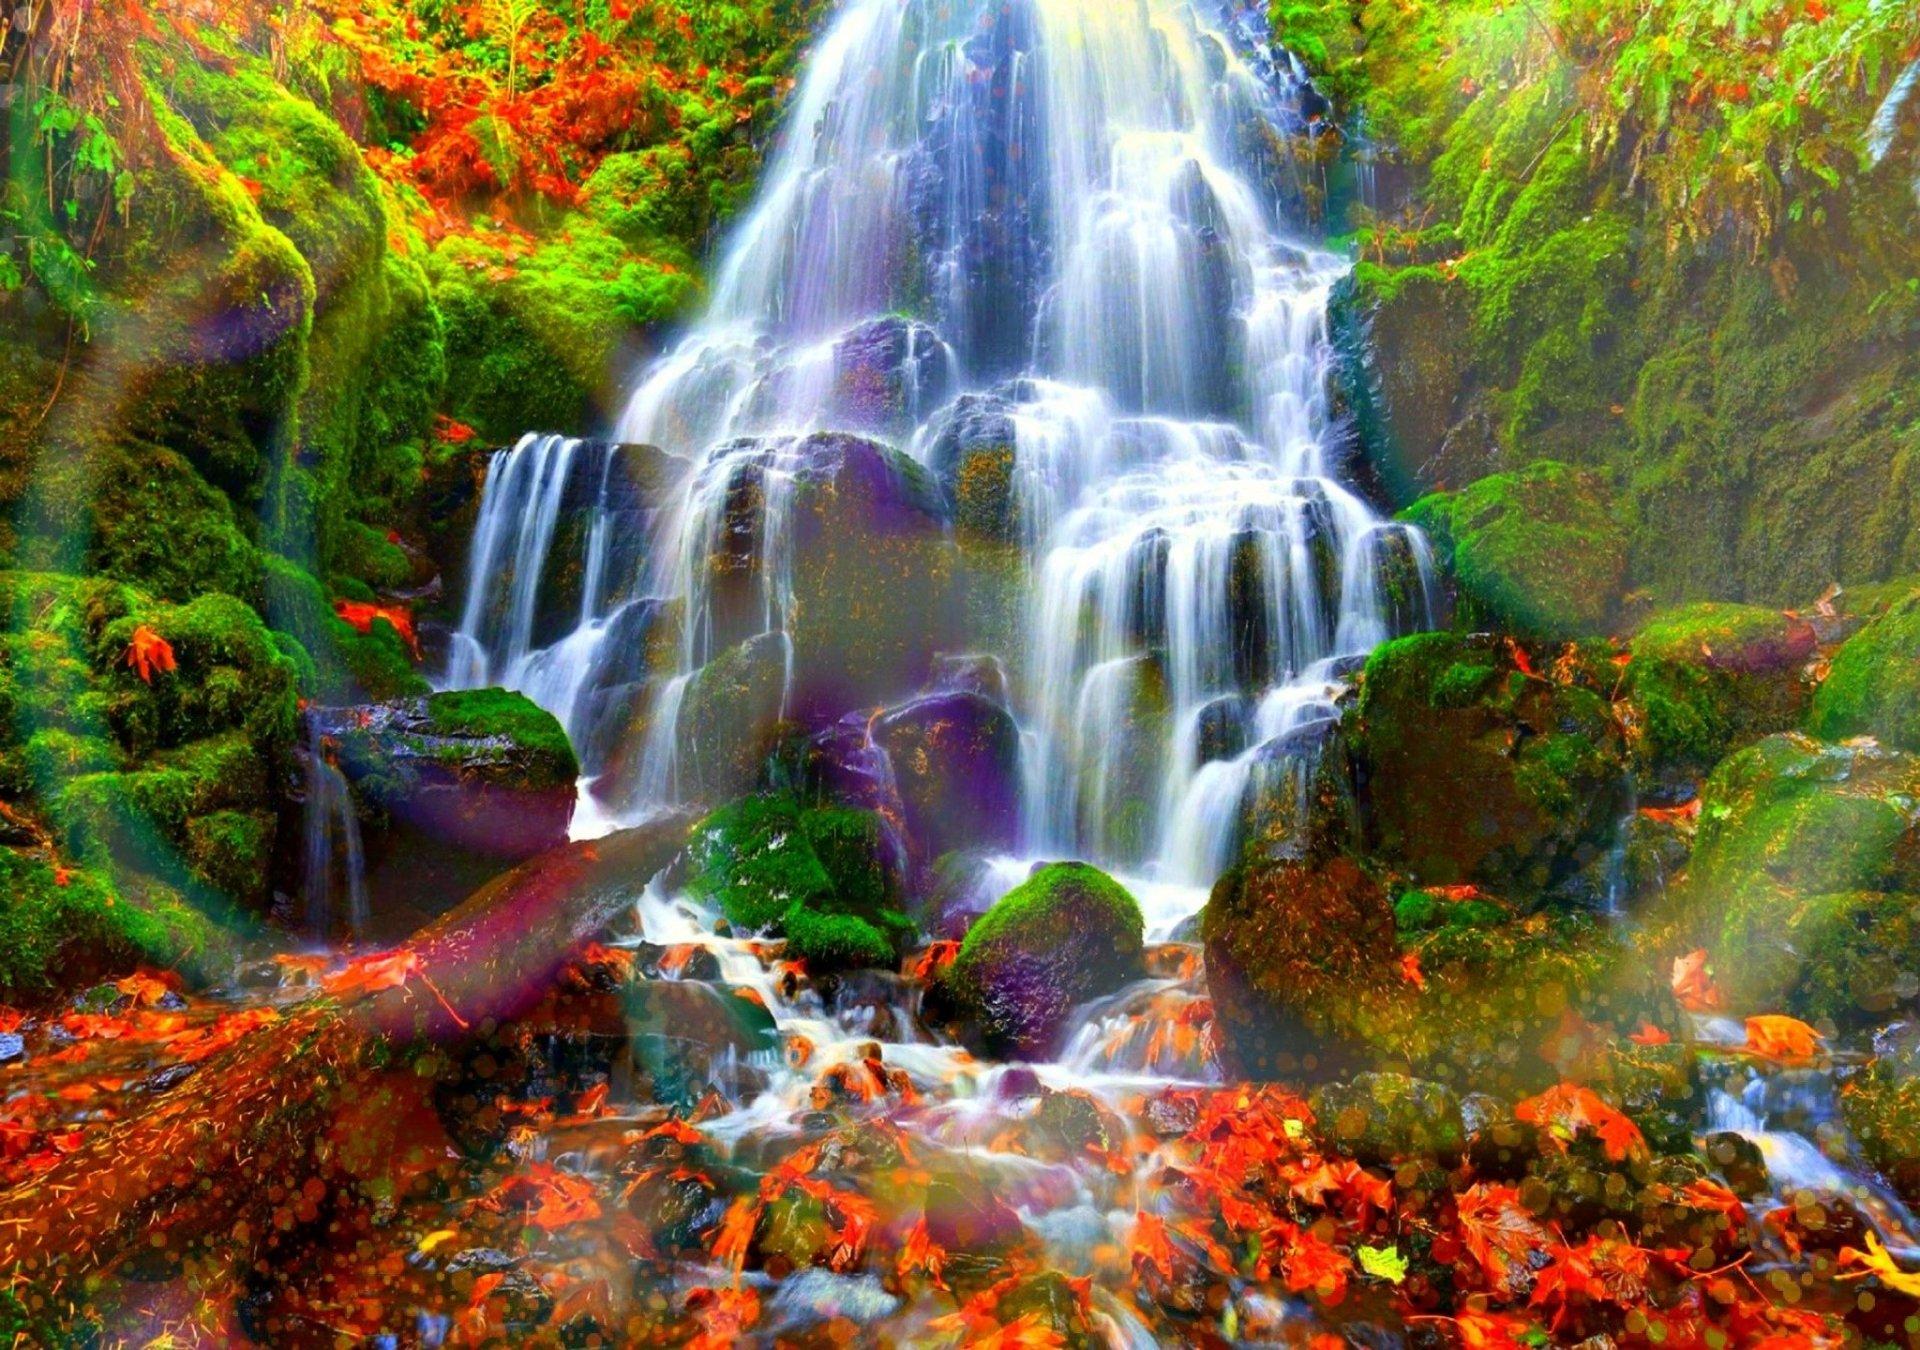 Autumn Forest Water Cascades HD Wallpaper   Background Image   2048x1440   ID:697361 - Wallpaper ...